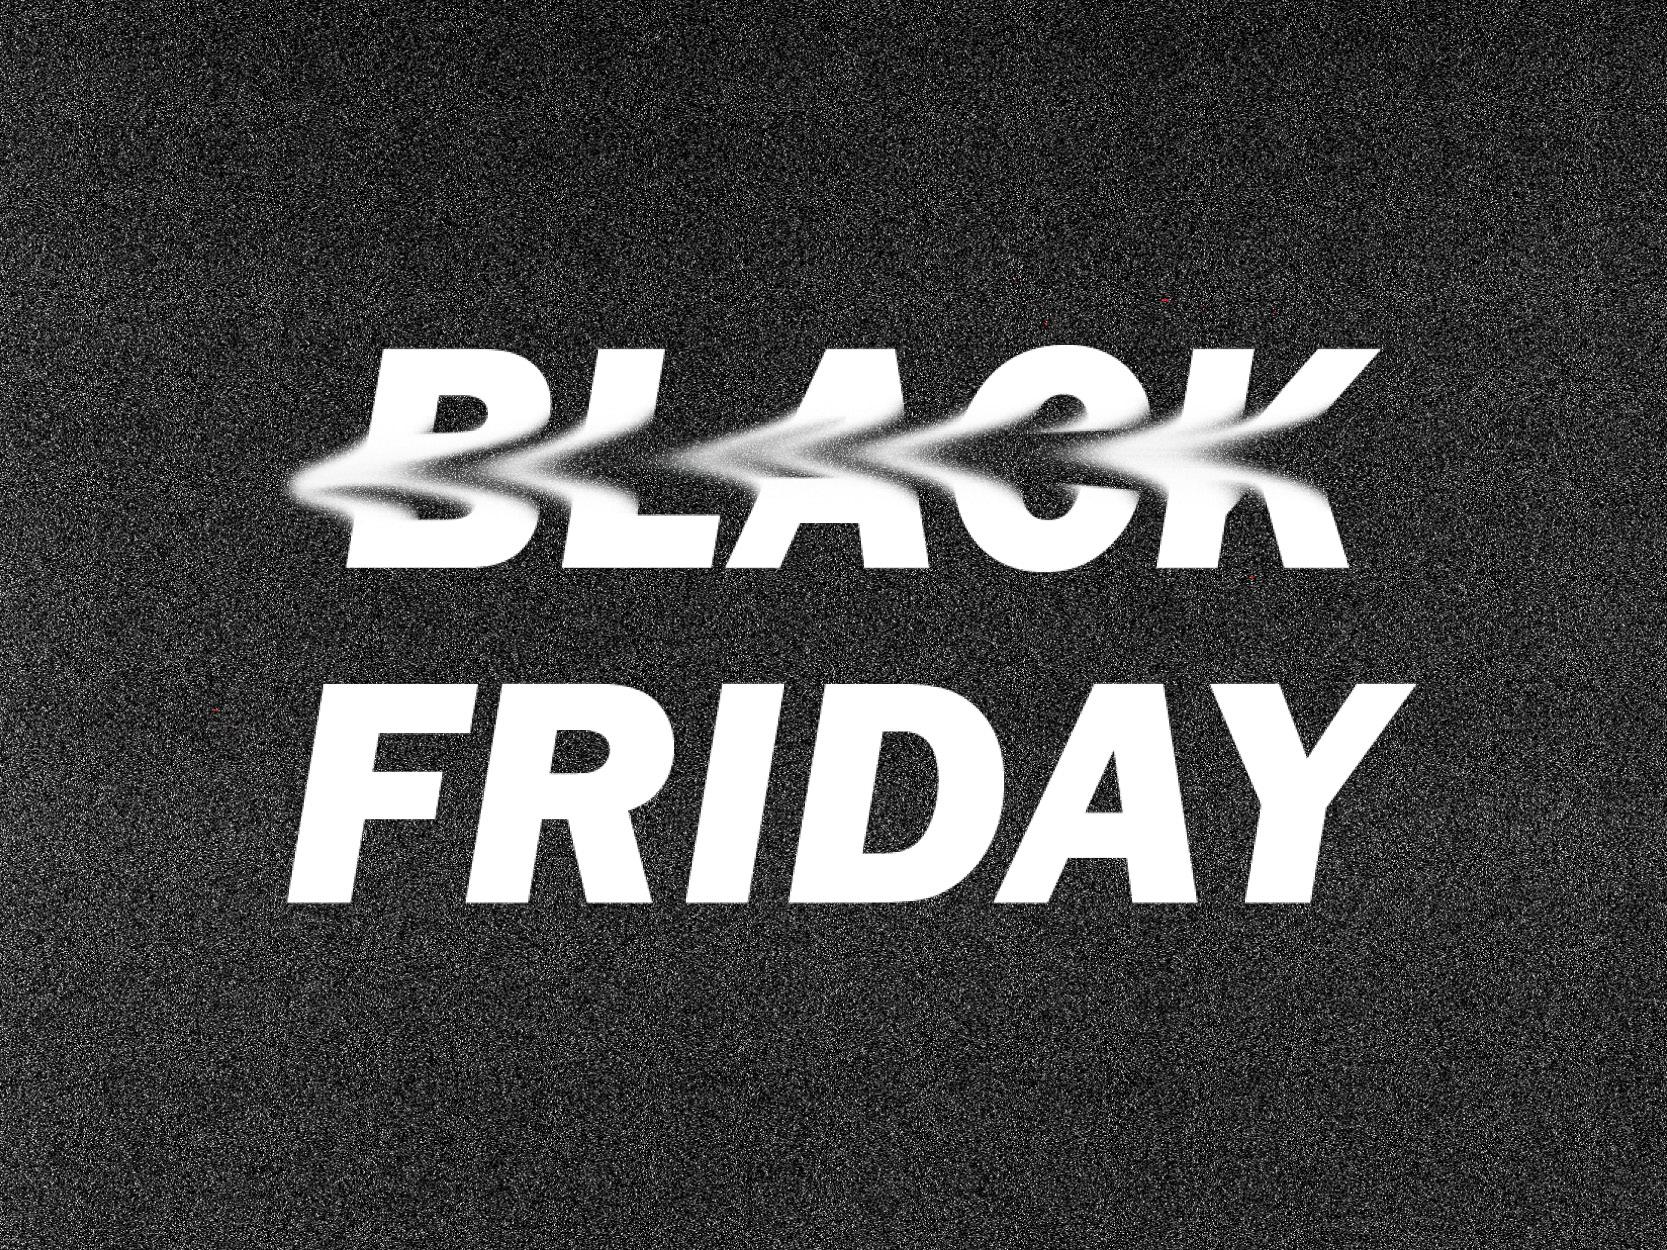 Black Friday 2019 Buycotts Blackouts And The Shopocalypse Peppermint Magazine